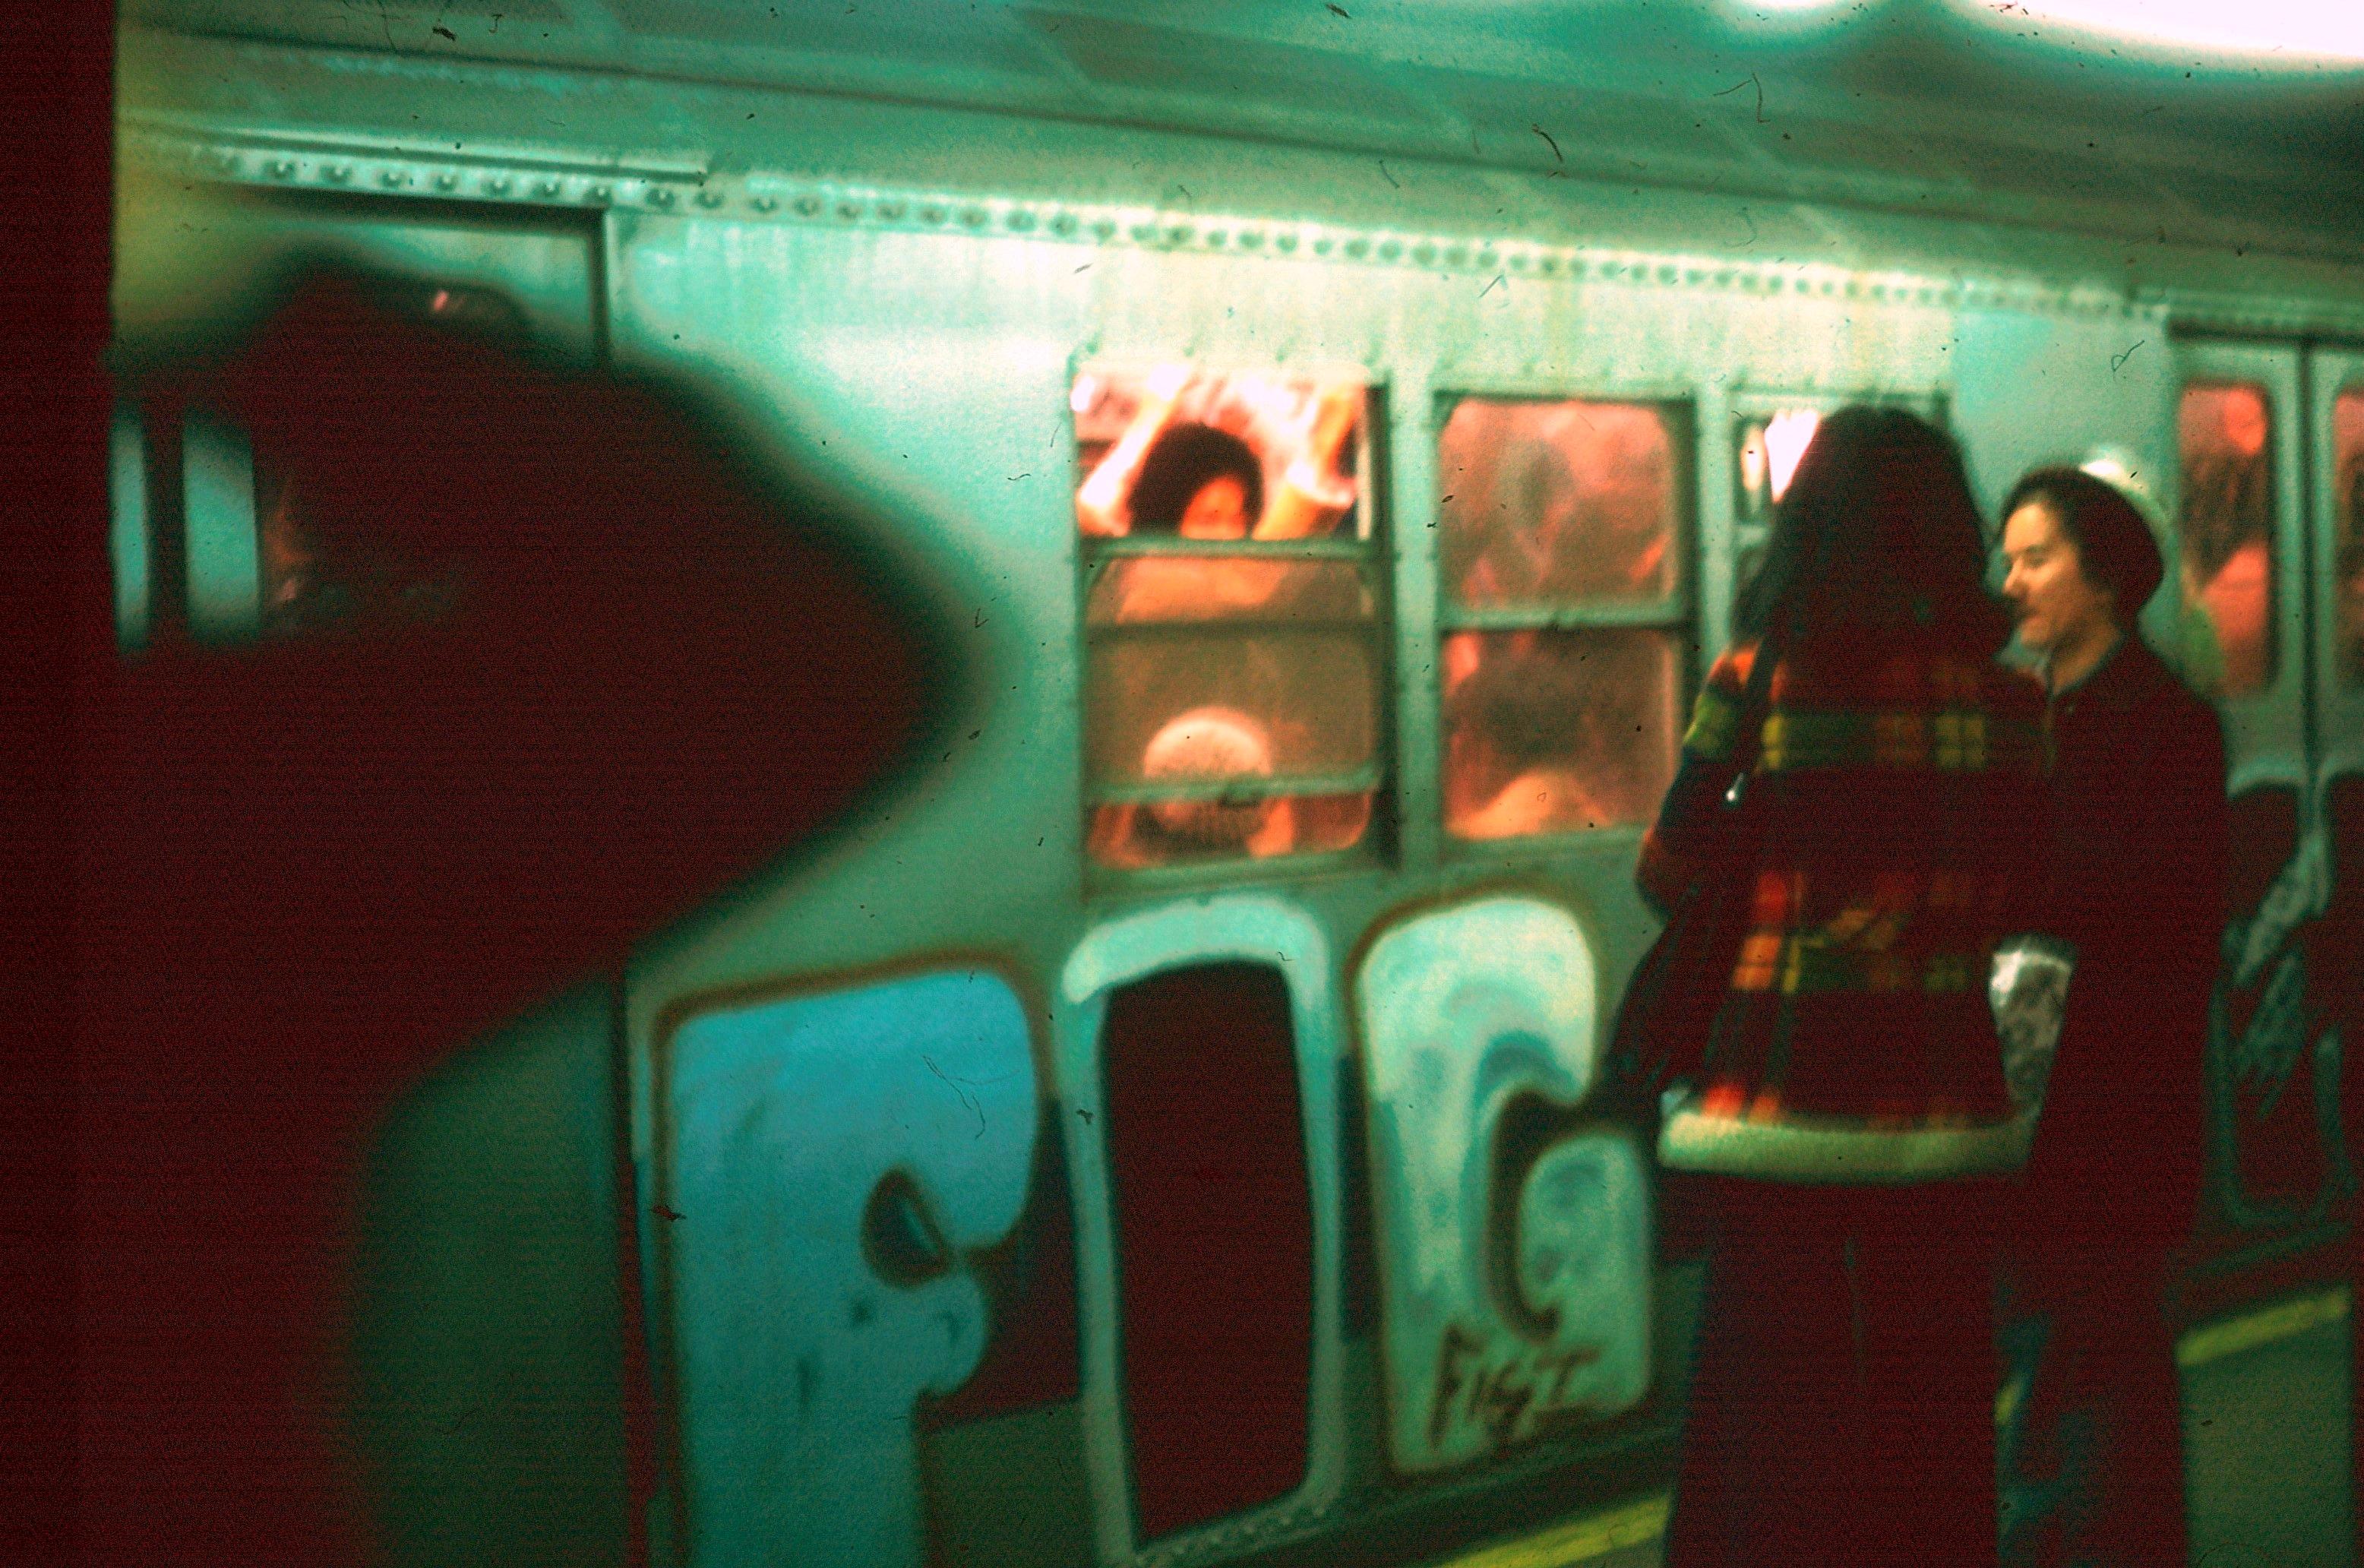 new york city subway graffiti. new york city subway graffiti.